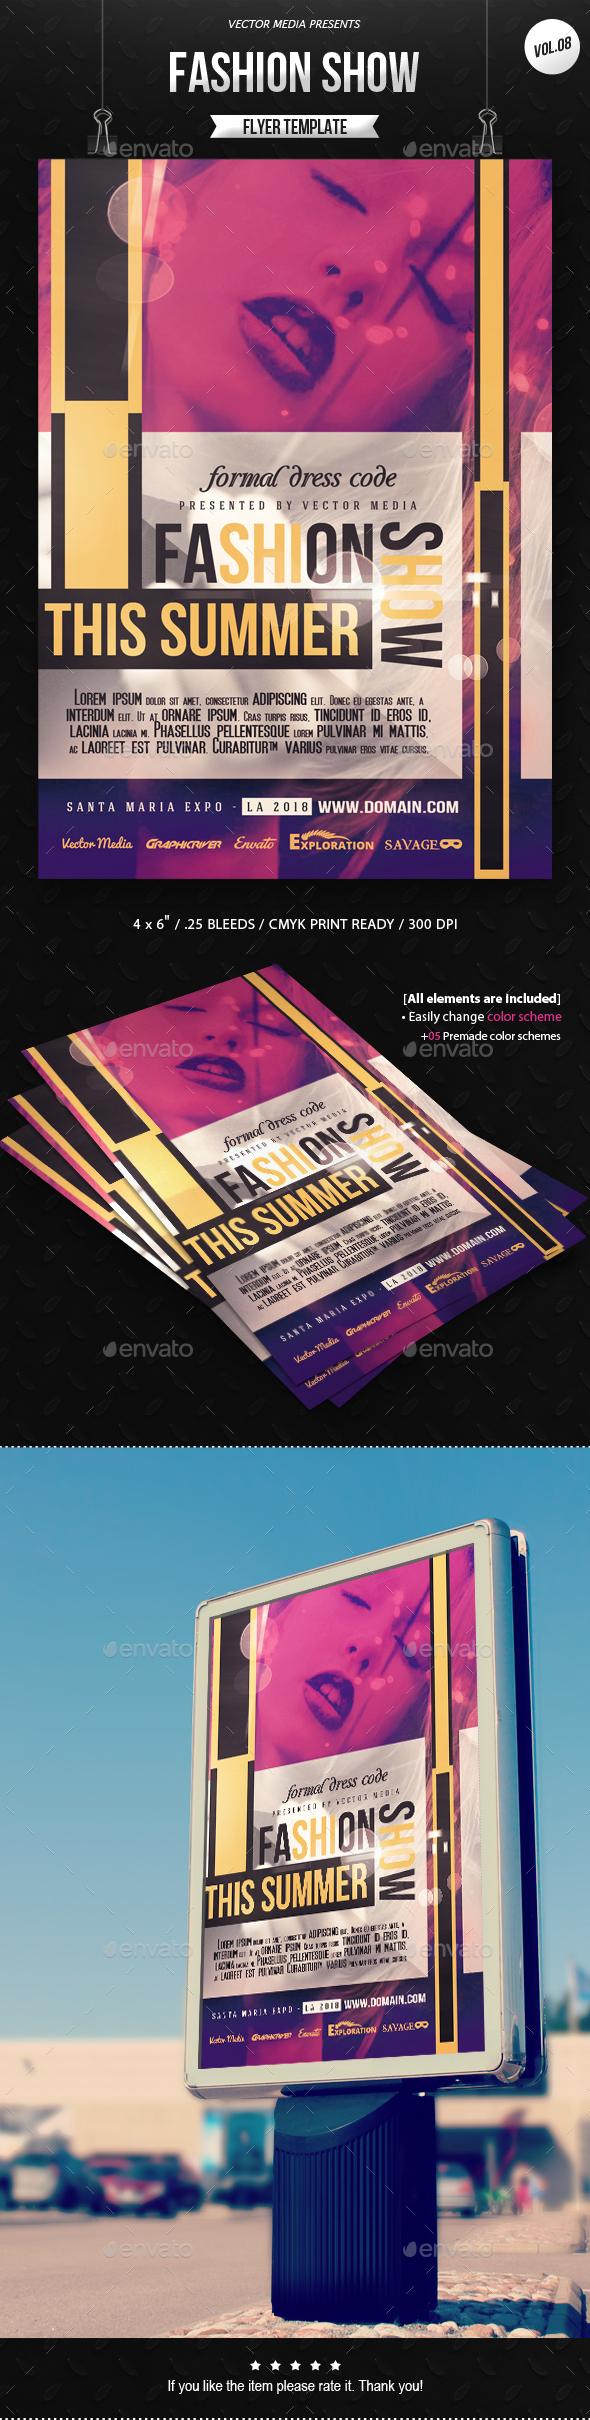 Fashion Show - Flyer [Vol.08] - Miscellaneous Events